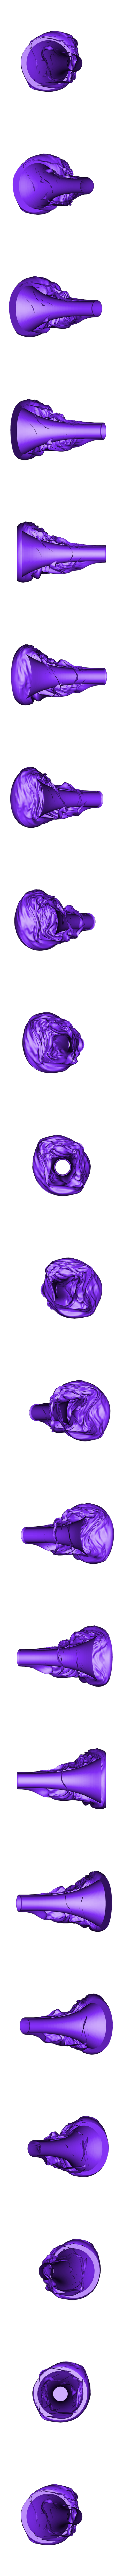 Fume Vase_by_Dominik Cisar.stl Download STL file Fume Vase • 3D printable design, cisardom